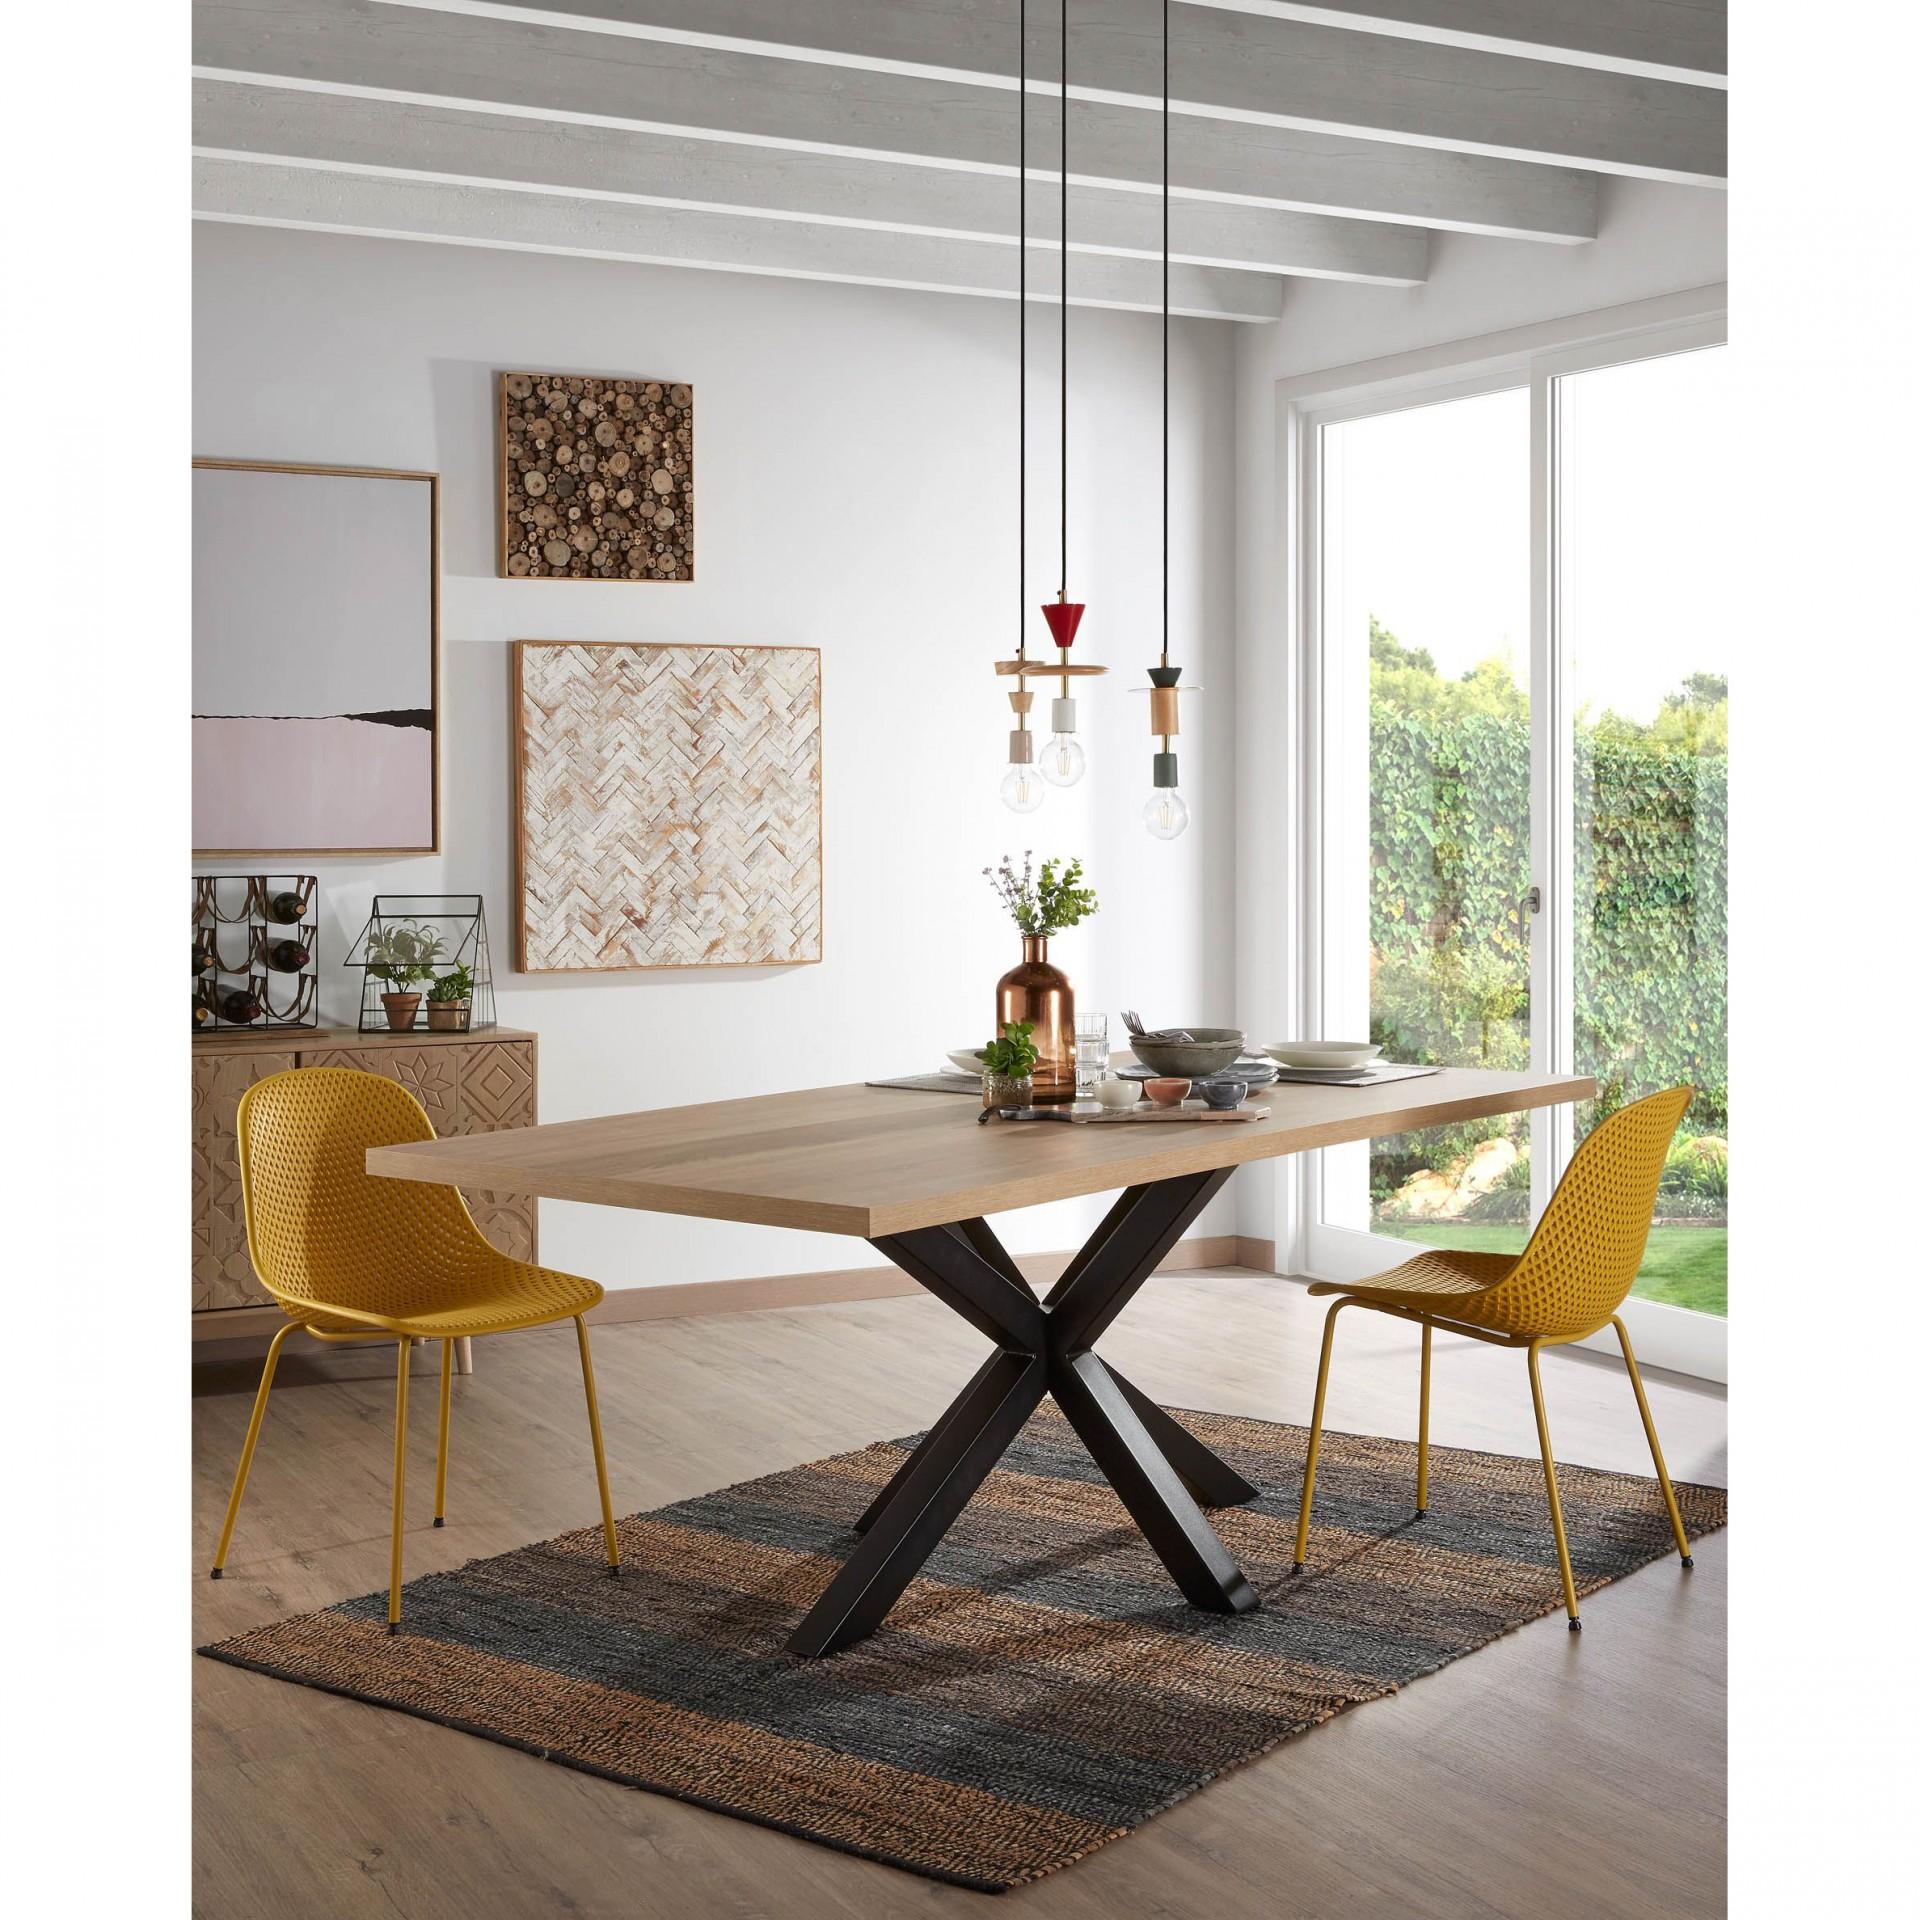 Mesa de jantar Arge, melamina/metal, preto